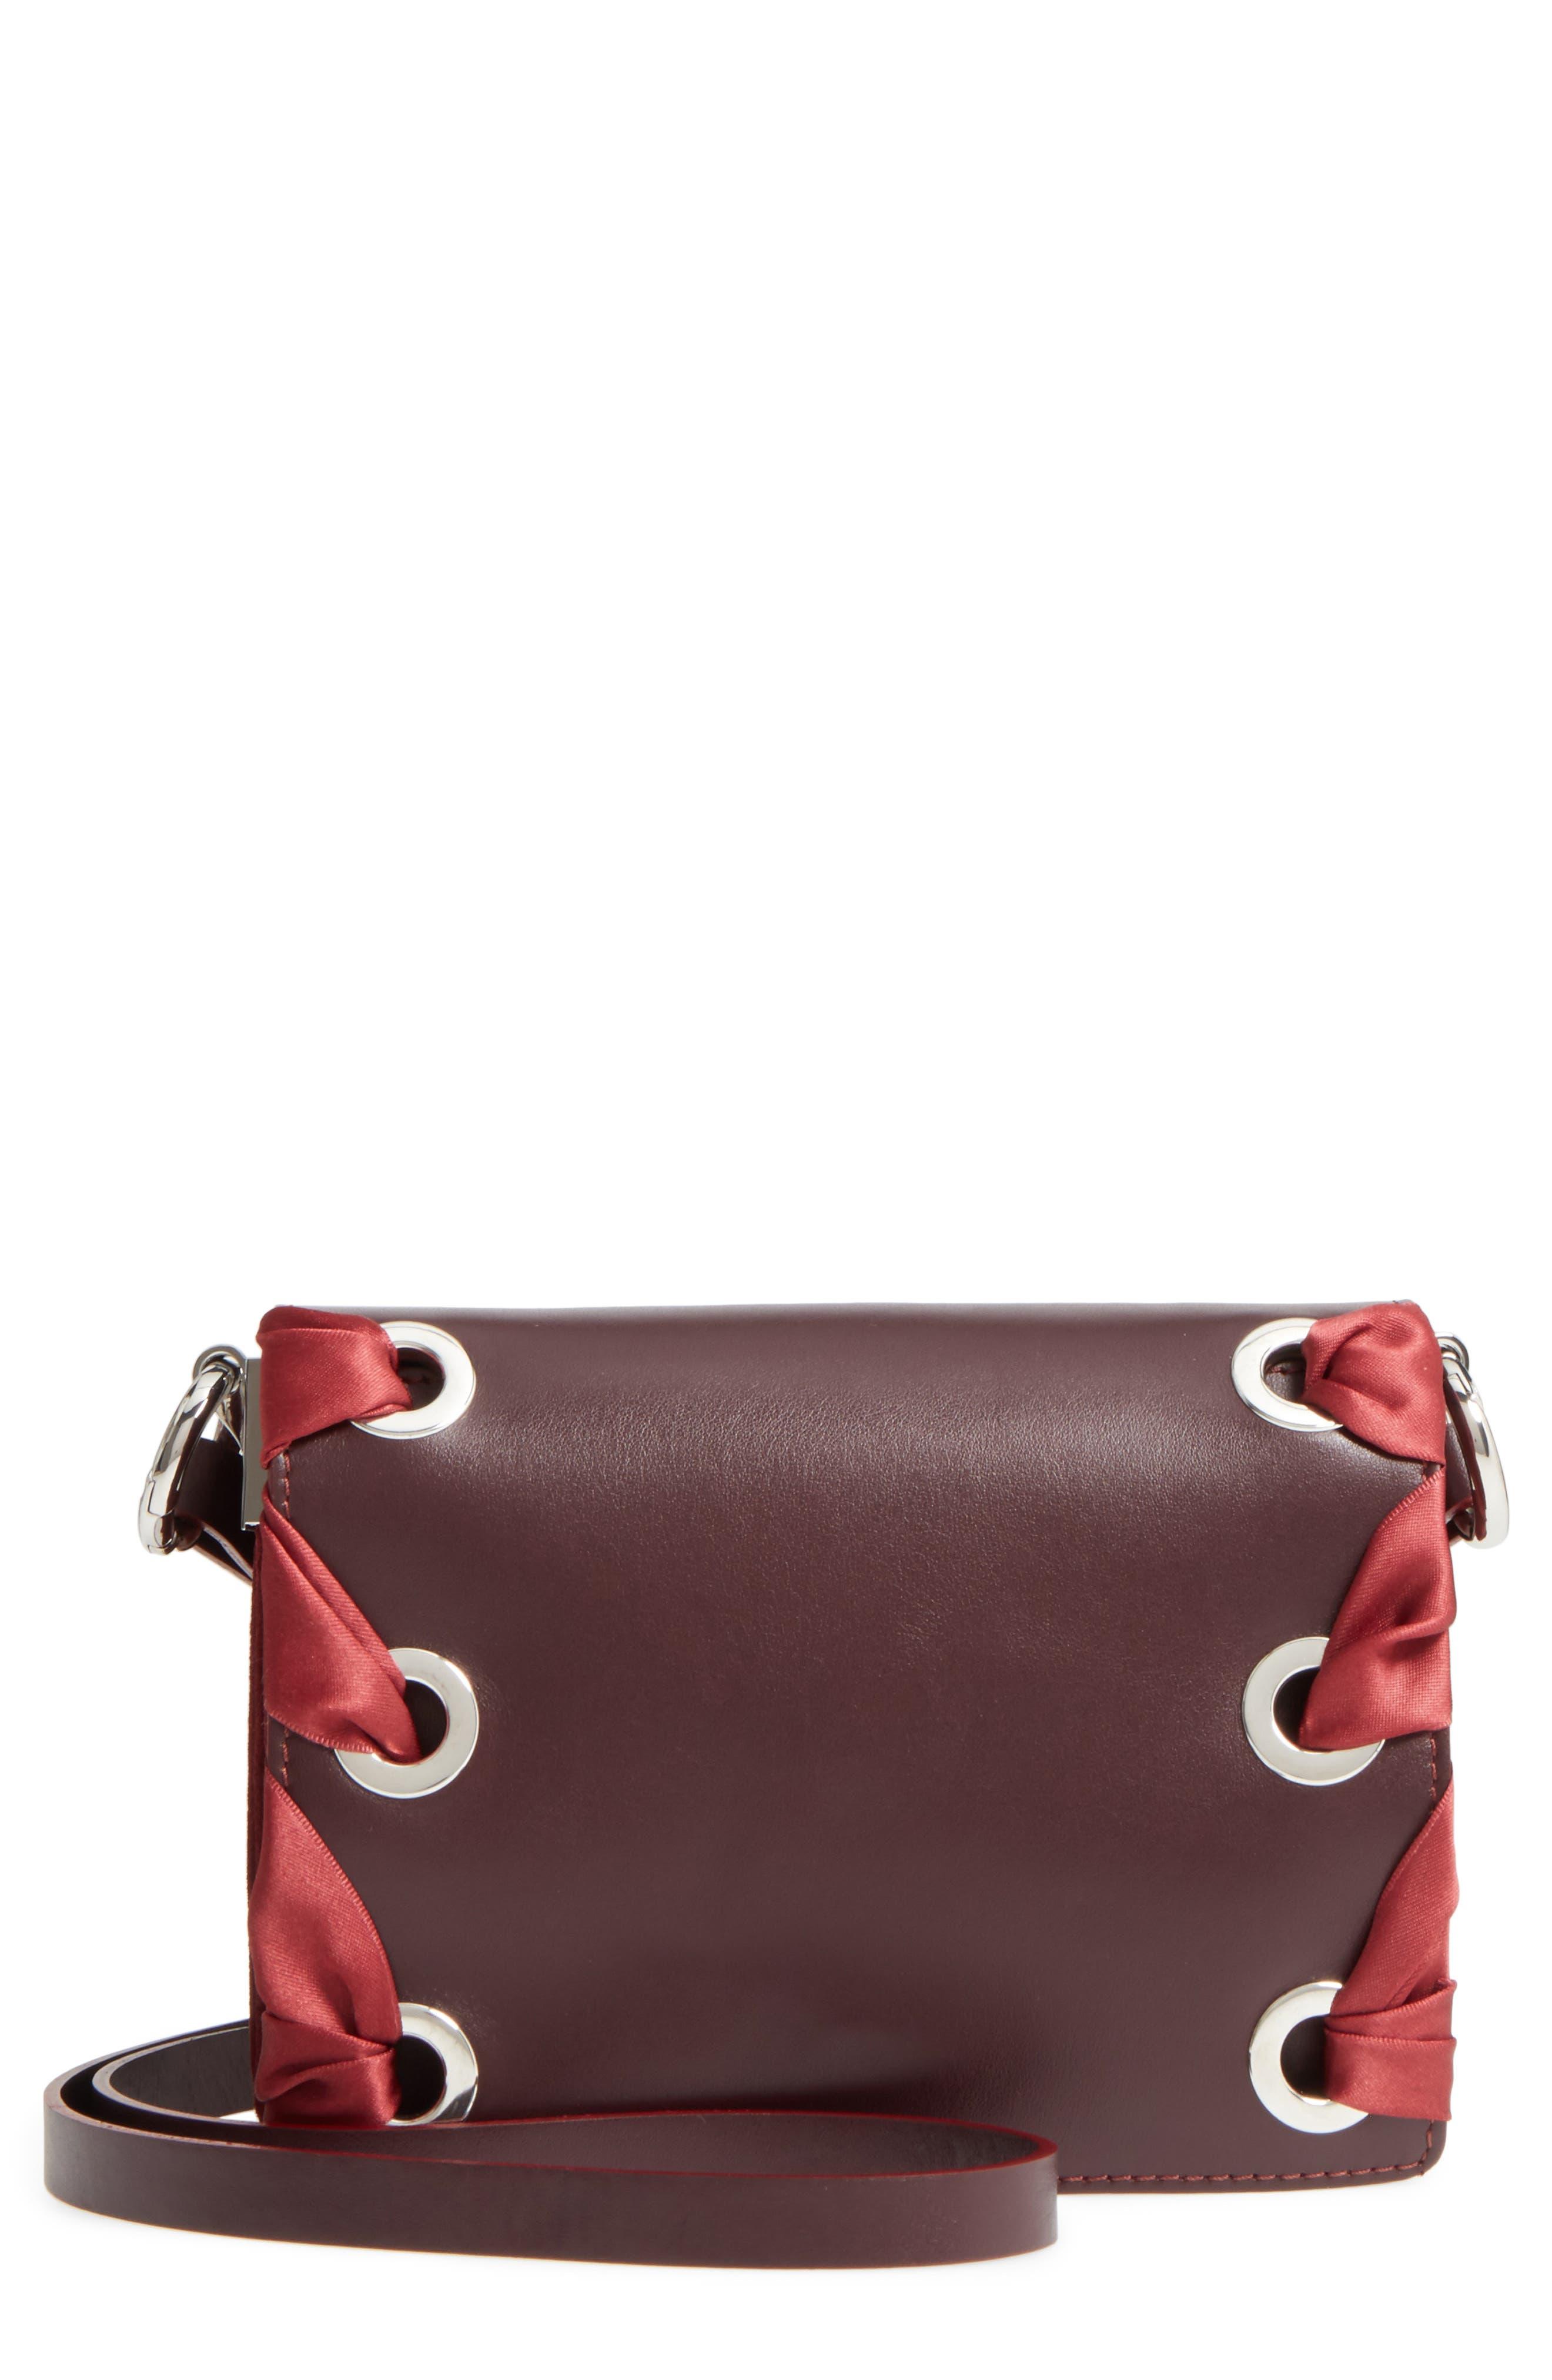 Alternate Image 1 Selected - Topshop Premium Leather Grace Crossbody Bag